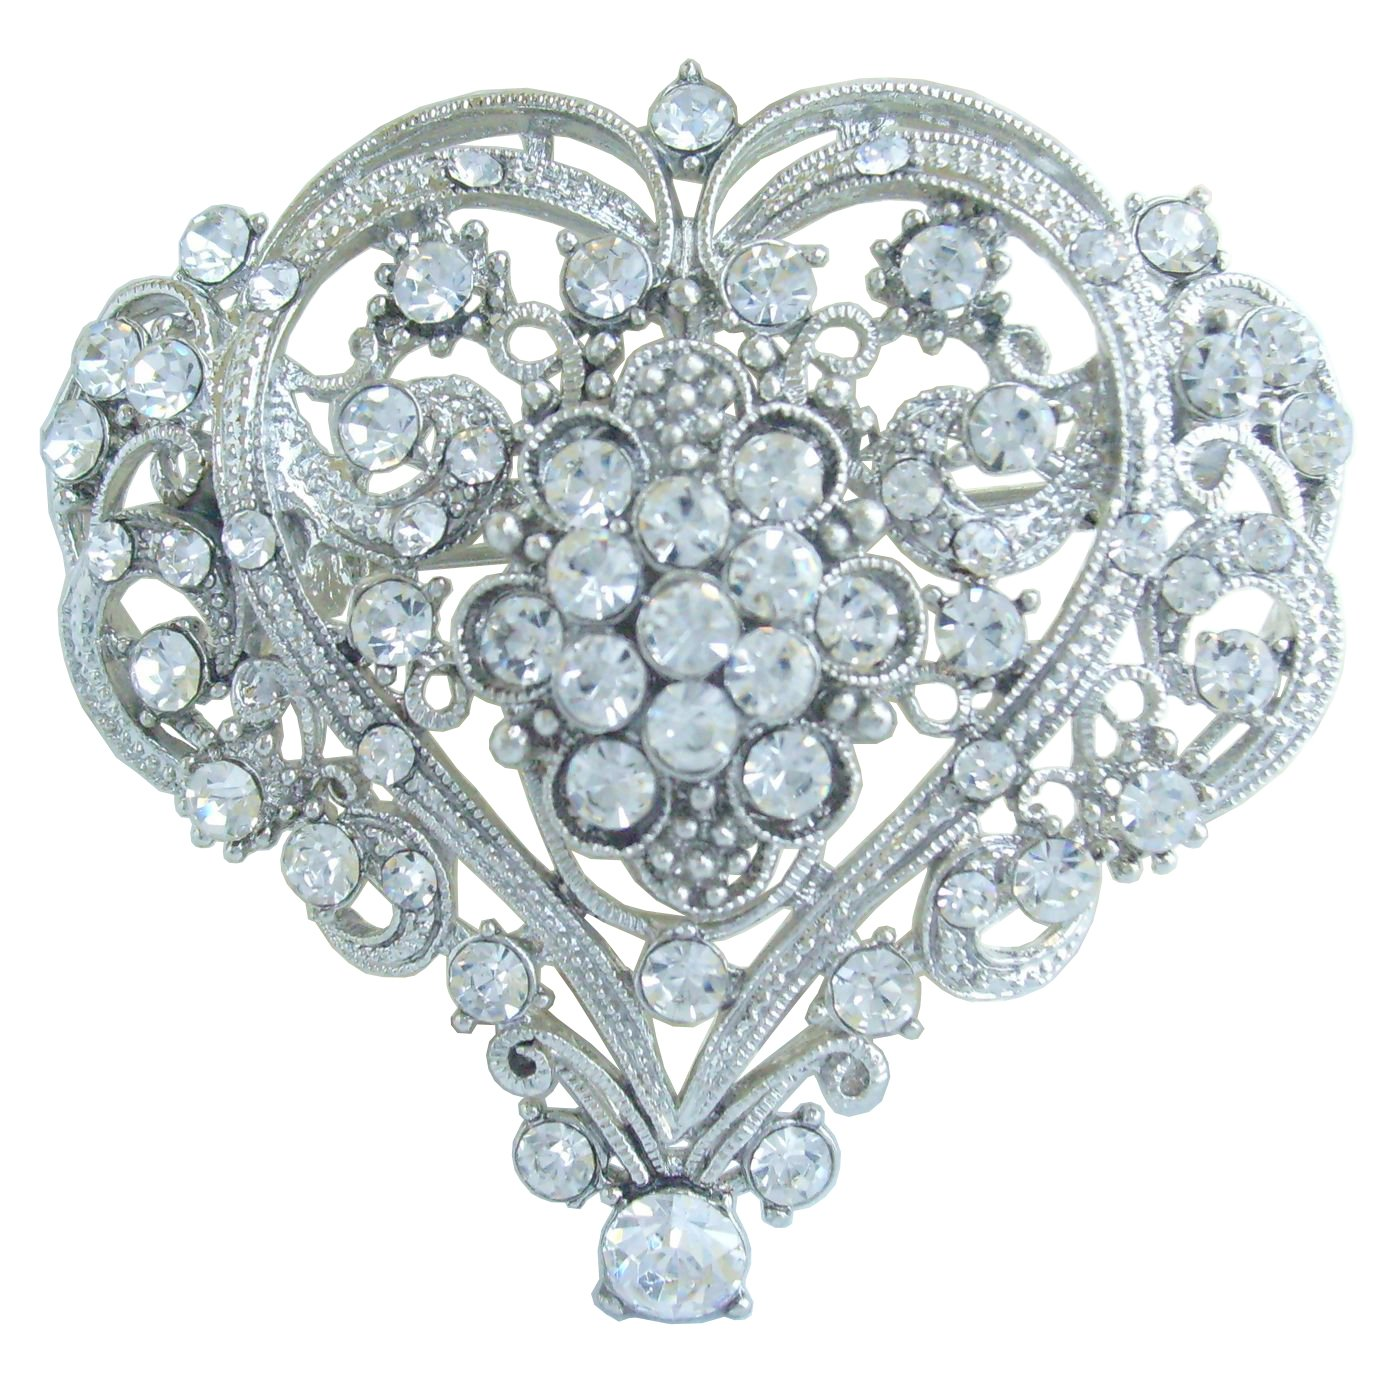 Sindary Wedding 2.17'' Love Heart Brooch Pin Clear Austrian Crystal Pendant BZ4640